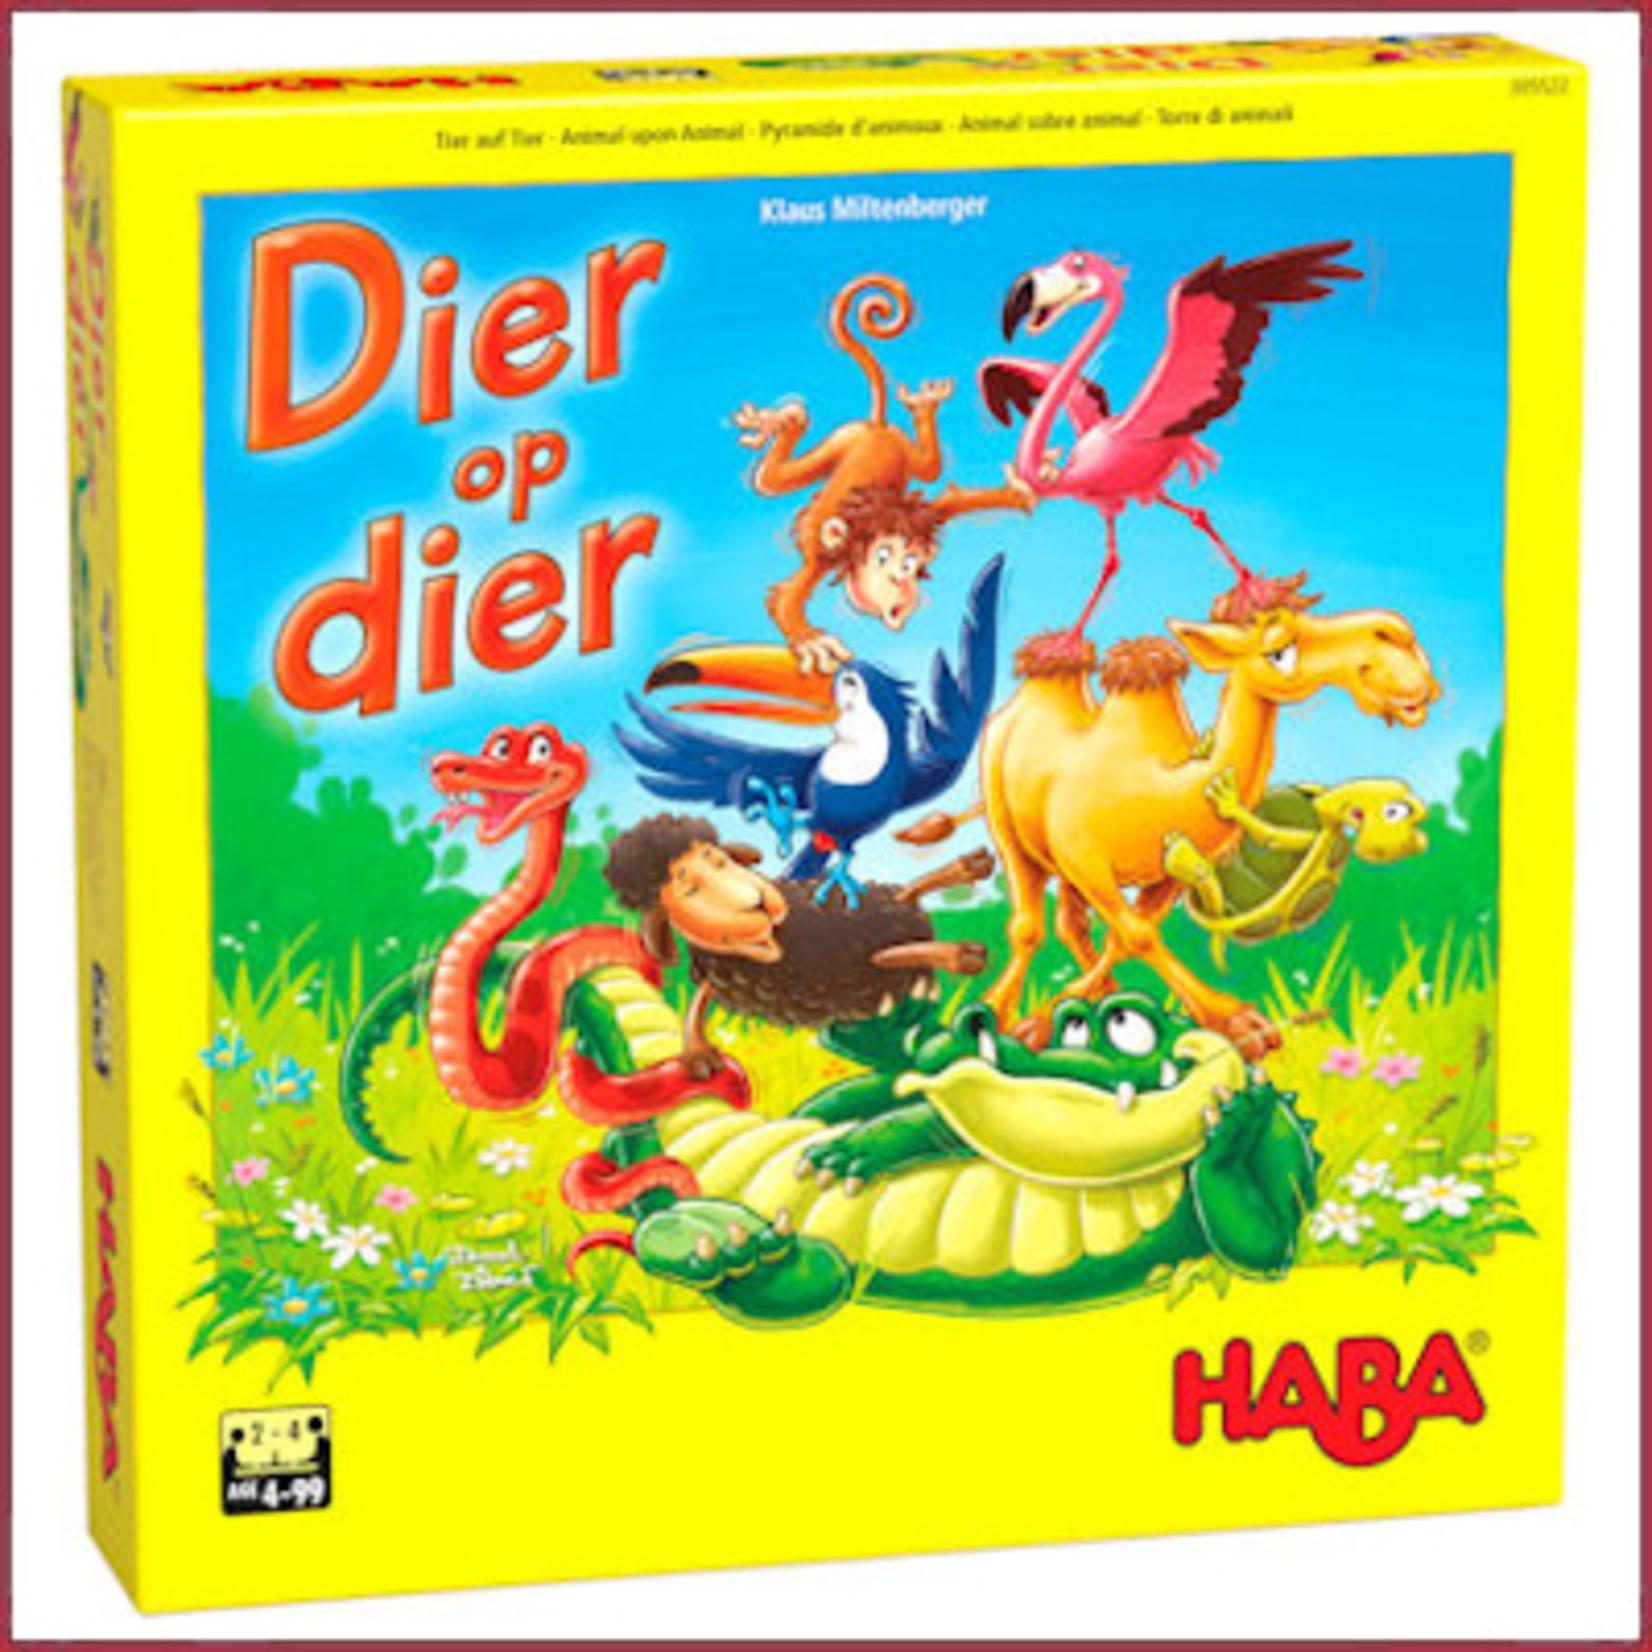 Haba Spel - Dier op Dier - het wankele stapelspel